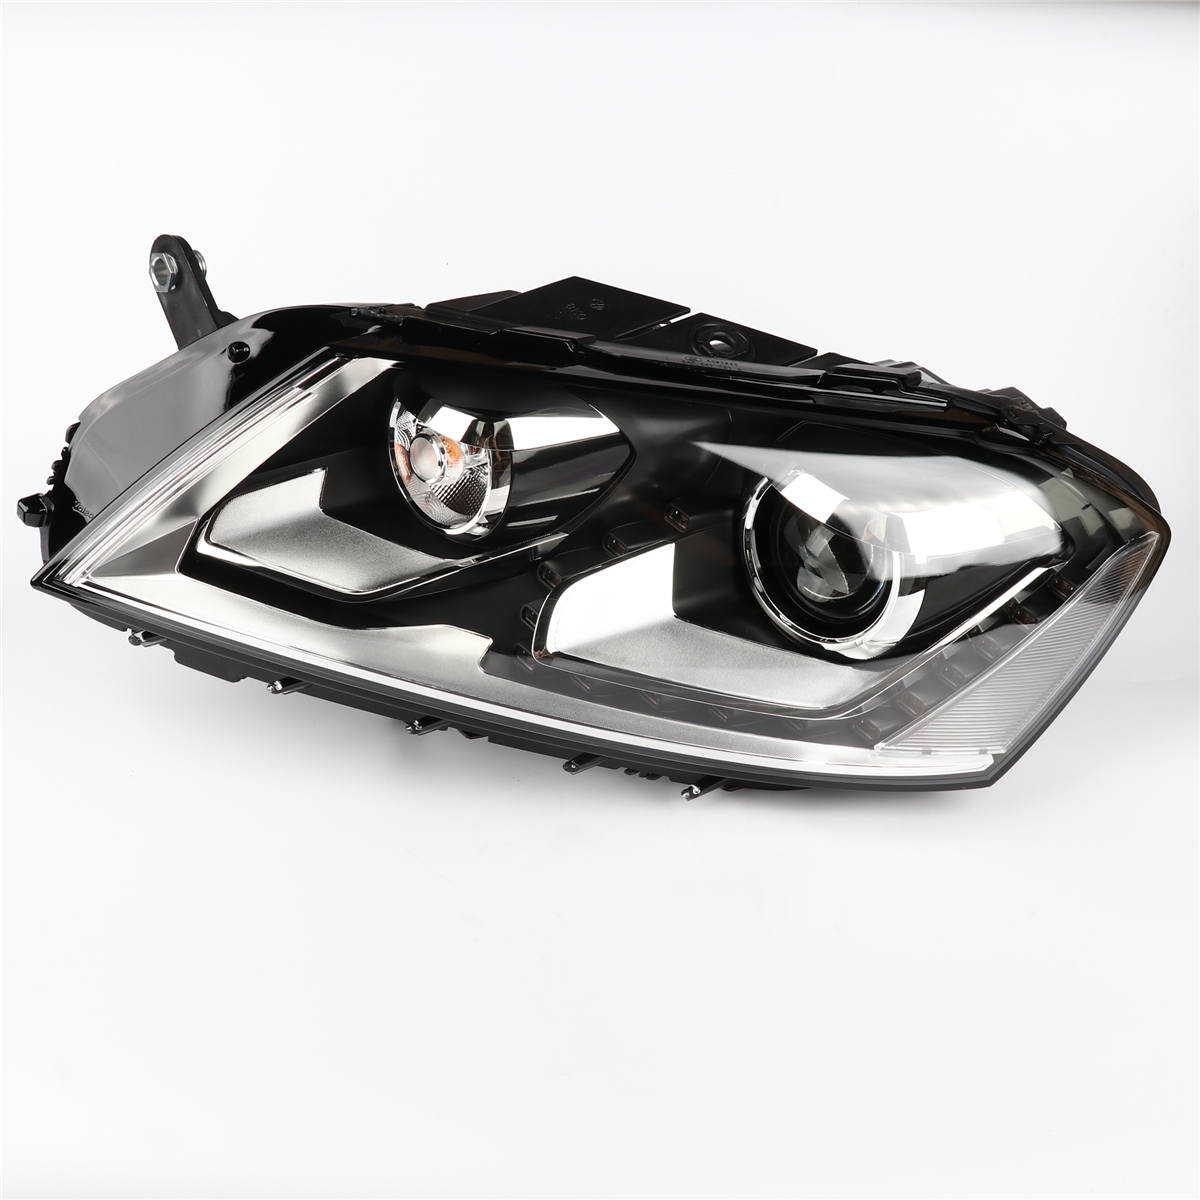 1Pcs Right Side OEM Head Light Lamp HID Xenon Headlight For VW Passat B7 L3AD 941 752 A